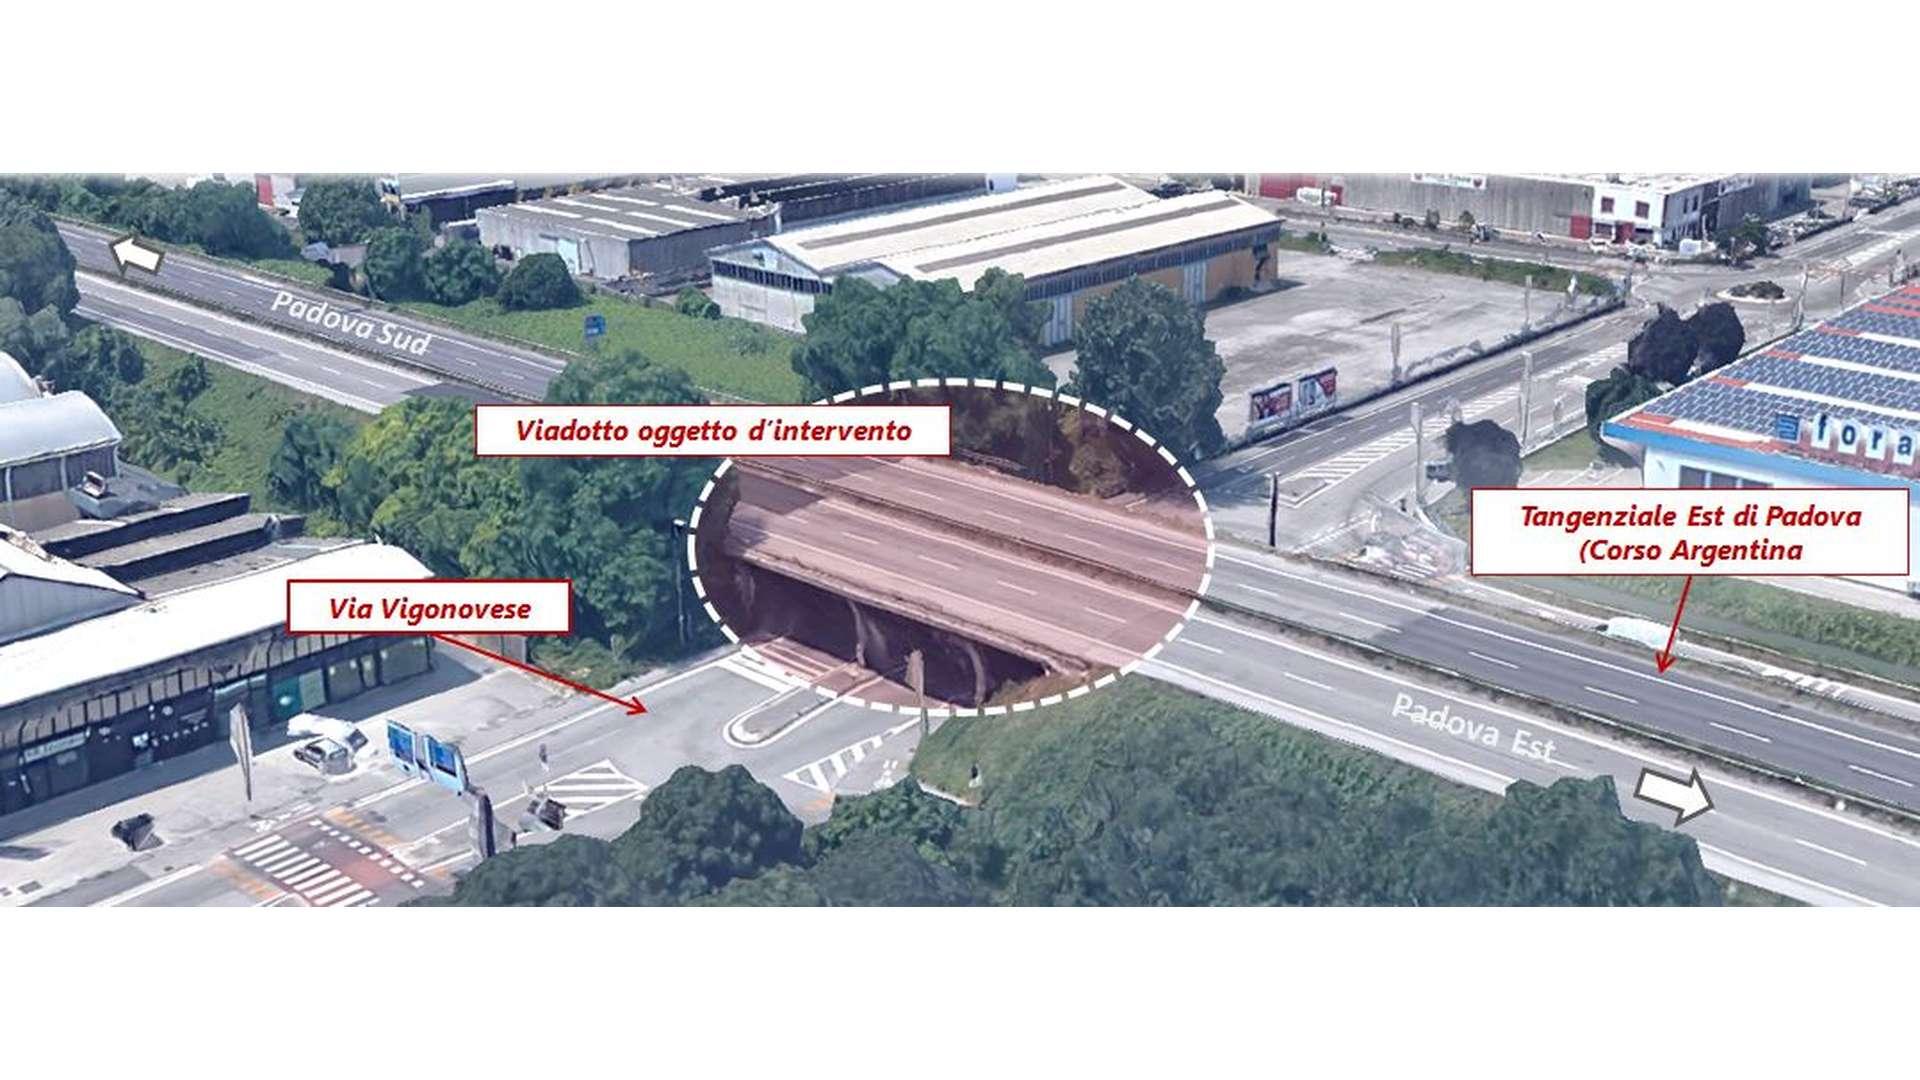 Ponte Vigonovese 001 efarm studio ingegneria Padova